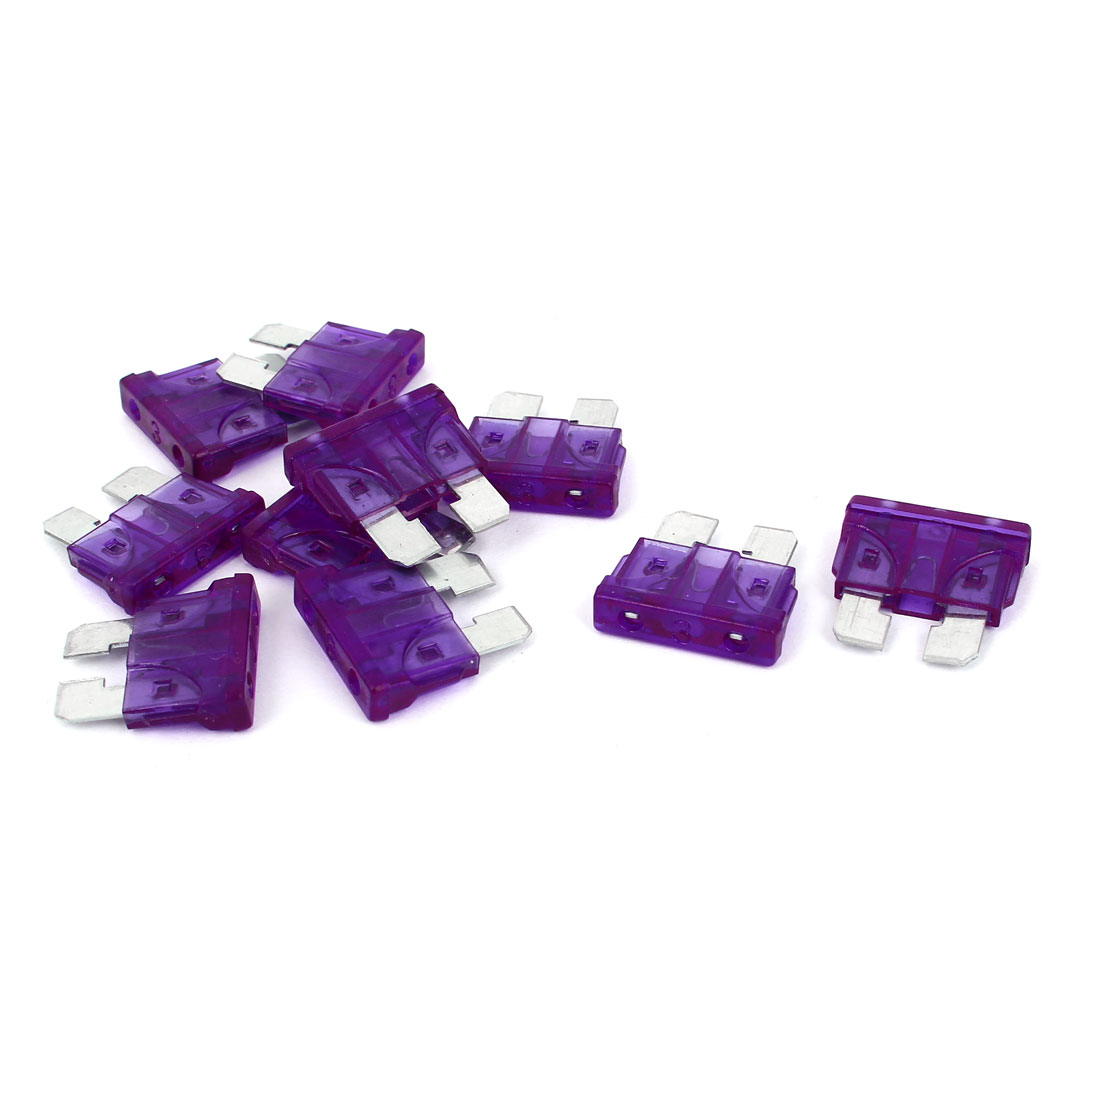 10PCS Purple Plastic Shell 3A 32V Standard ATC/ATO  Fuse for Auto Car